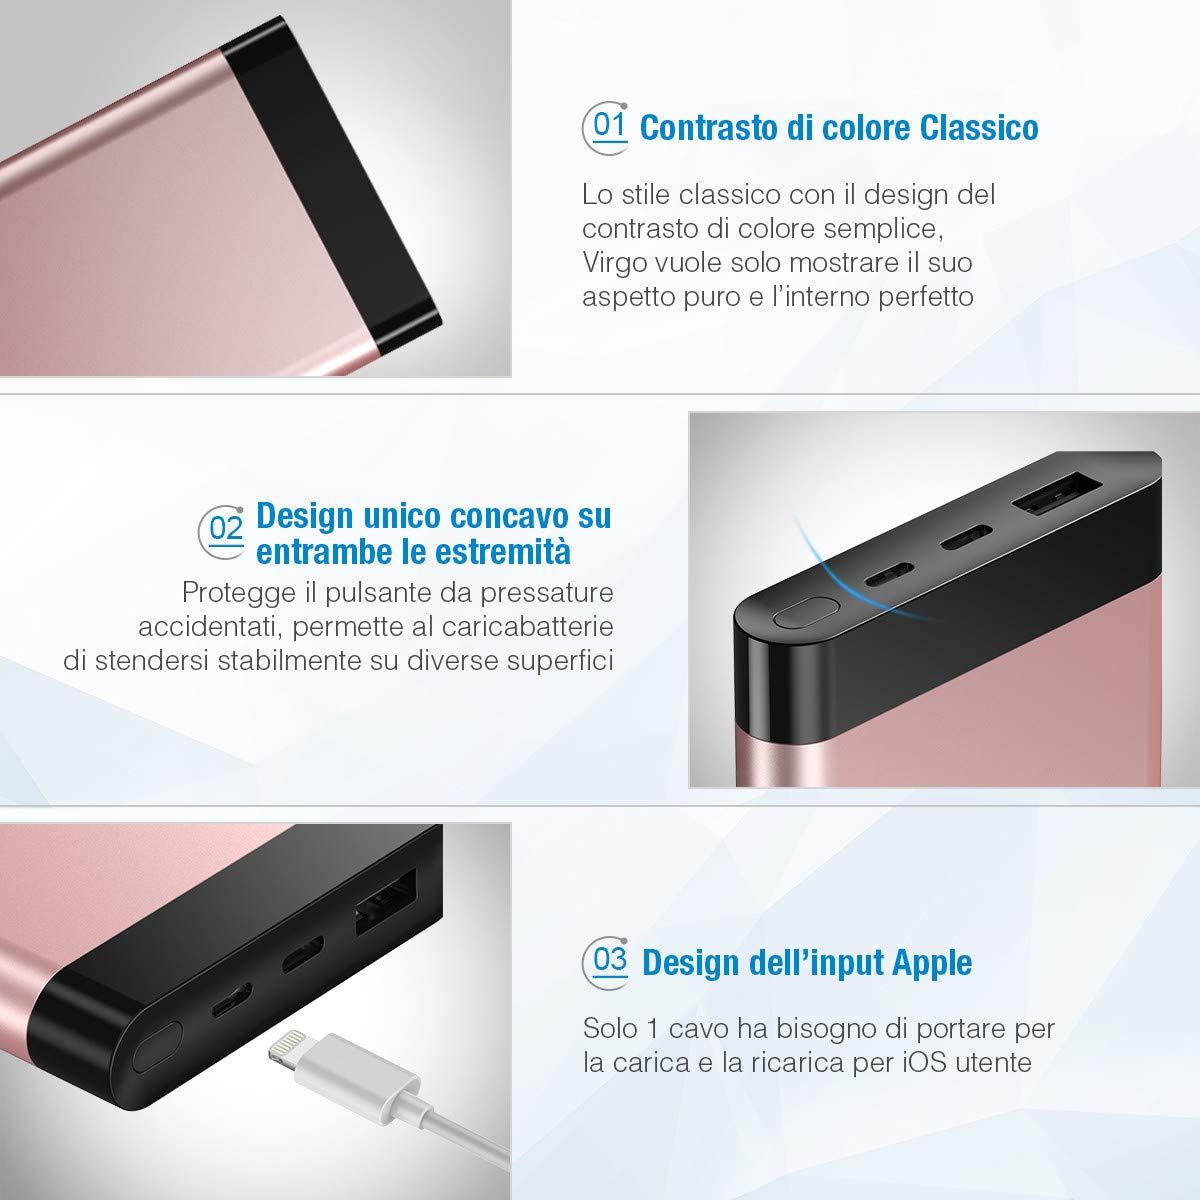 POWERADD Virgo II Powerbank Batteria Portatile 10000mAh con 2 Uscite, Caricabatterie Portatile con display LED, Entrata Lightning + Type-C per iPhone X / 8/7 / 6, Samsung S9 / S8 + e tanti altri